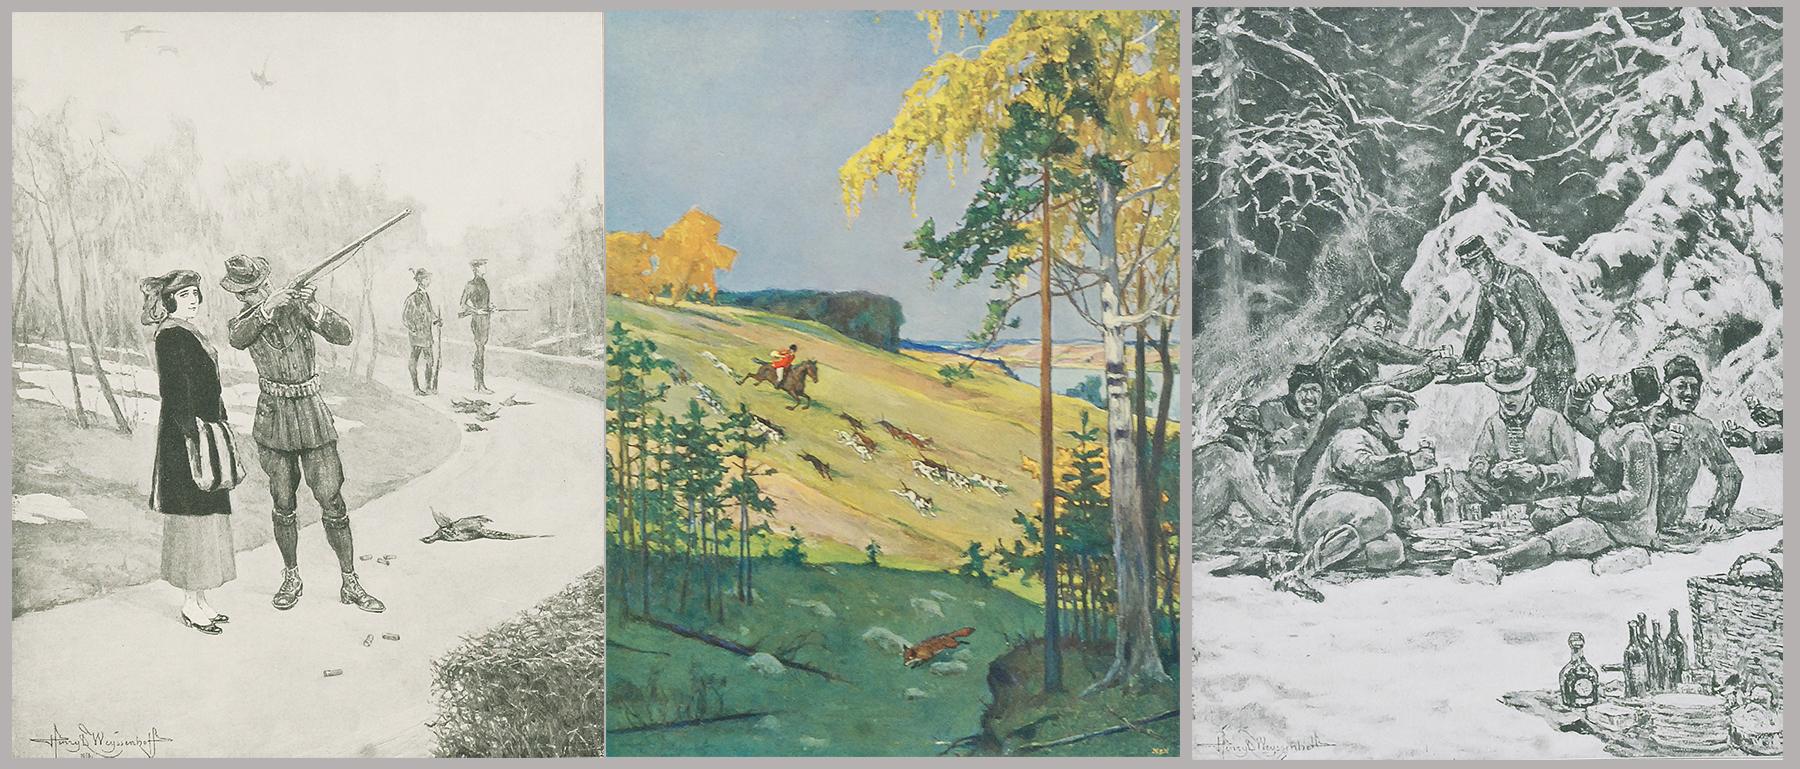 Józef WEYSSENHOFF (1860-1932), Henryk WEYSSENHOFF (1859-1922)